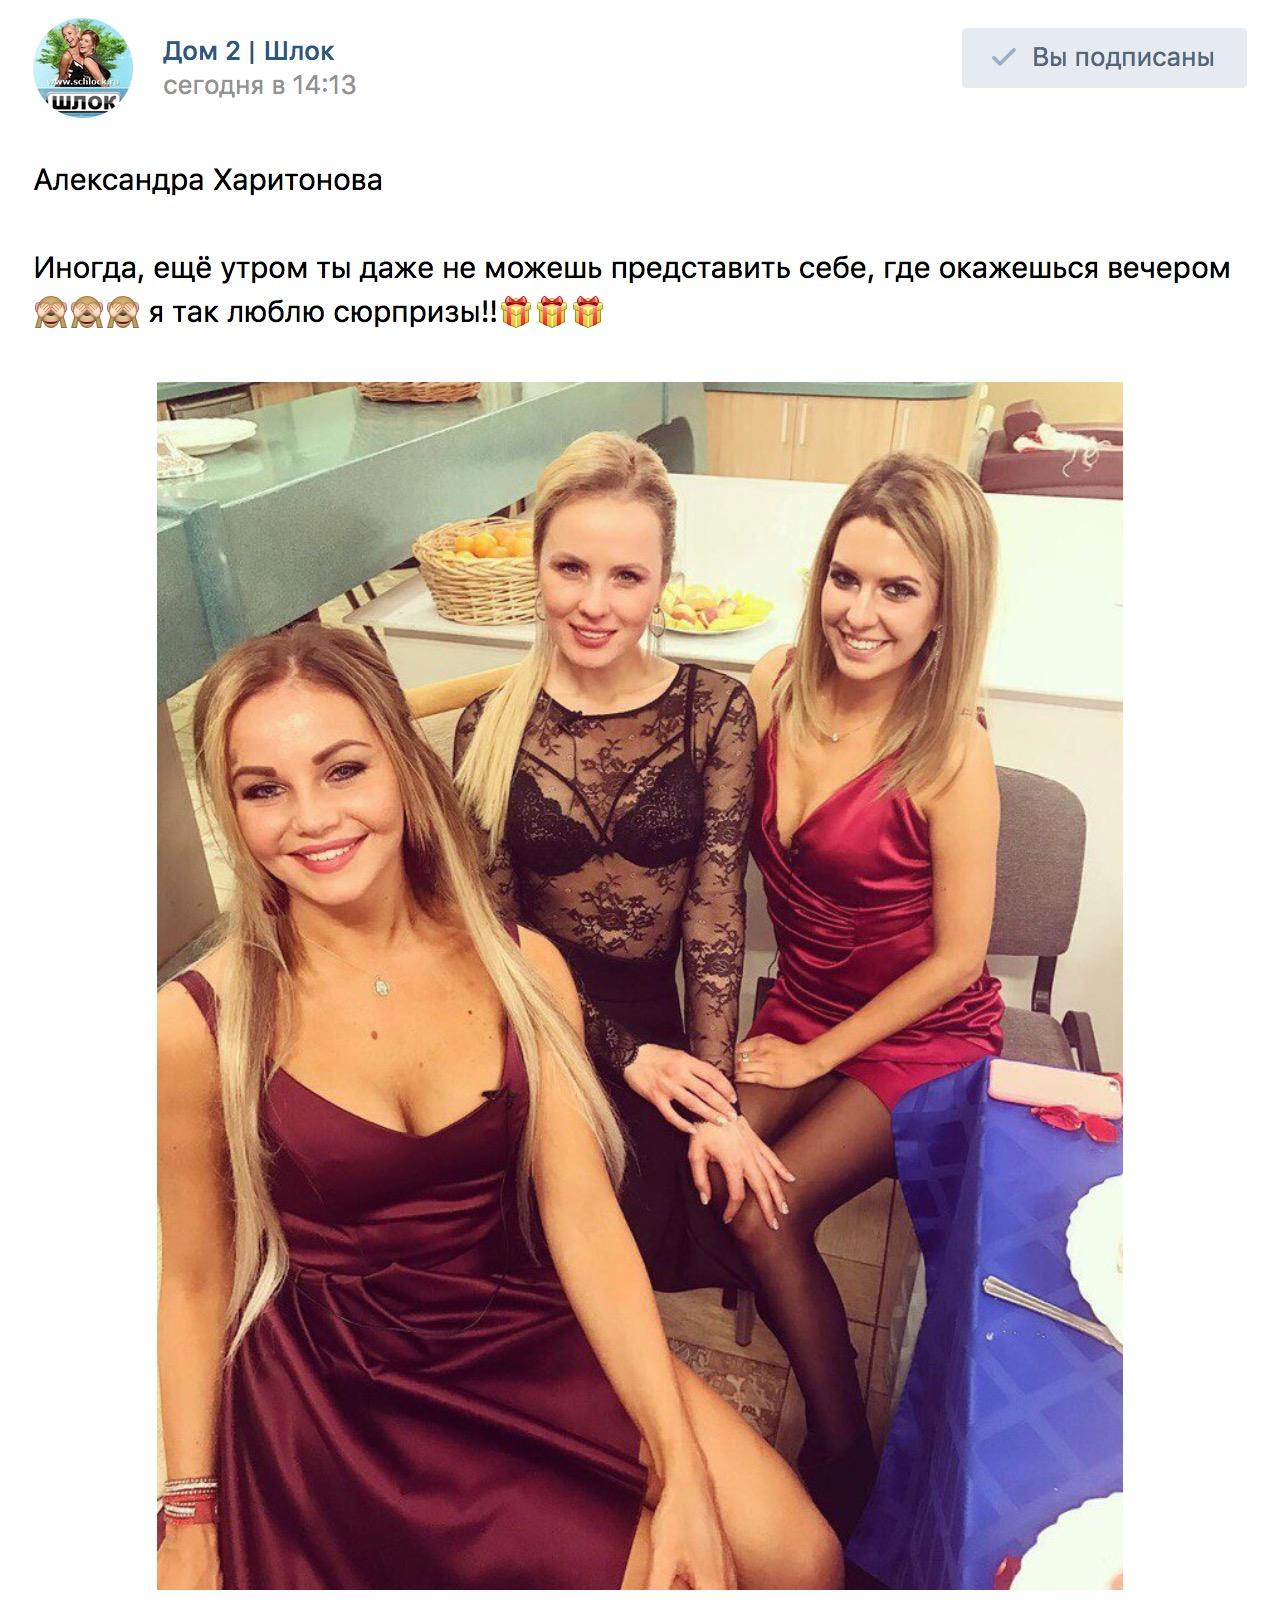 Александра Харитонова. Иногда...